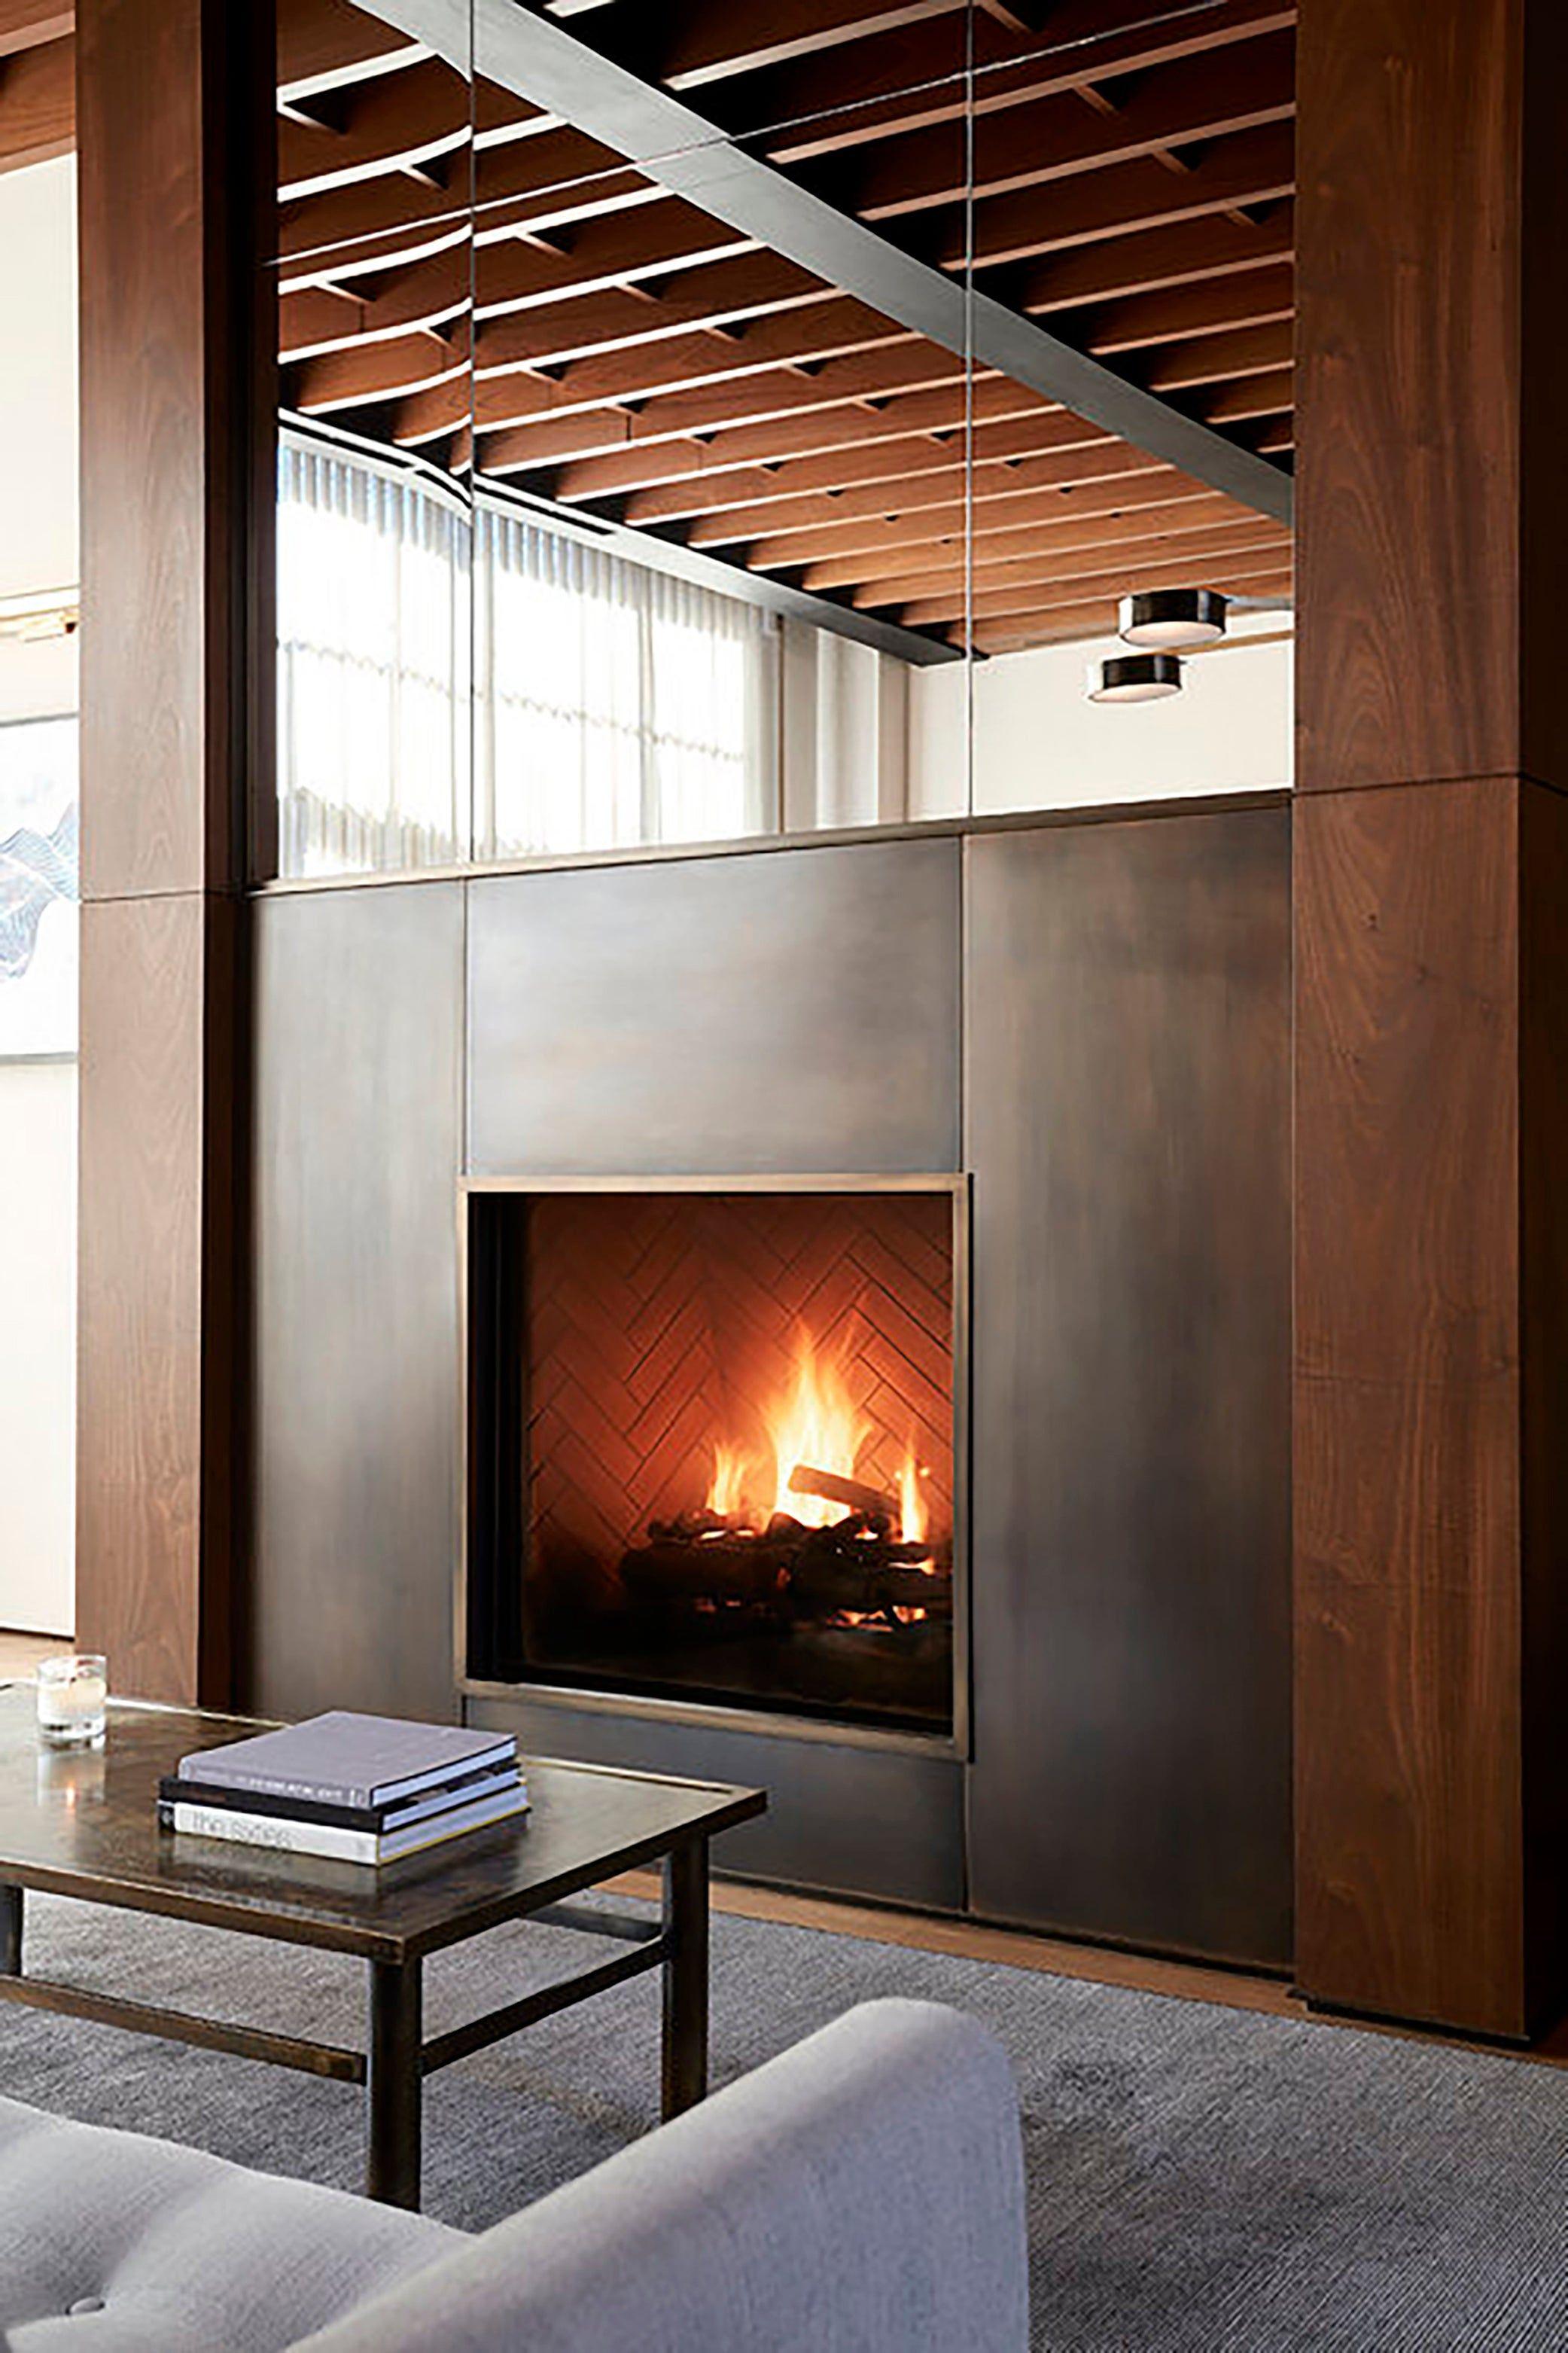 Pin By Sedef Ilgaz On Somine In 2020 Best Interior Design